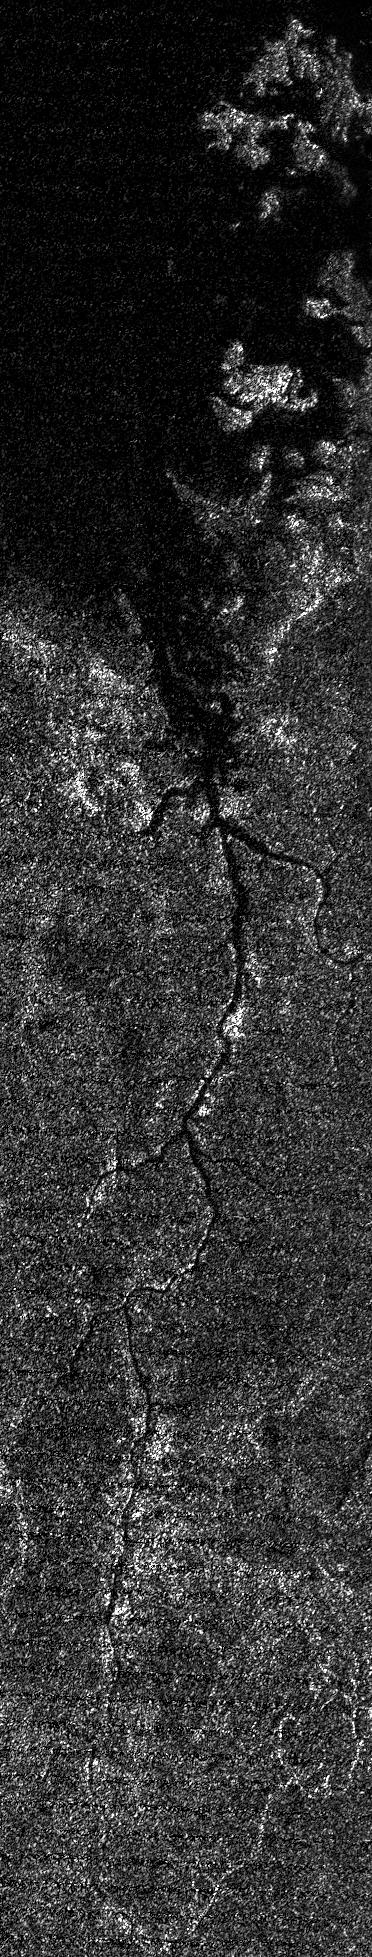 PIA16197 Titan river.jpg